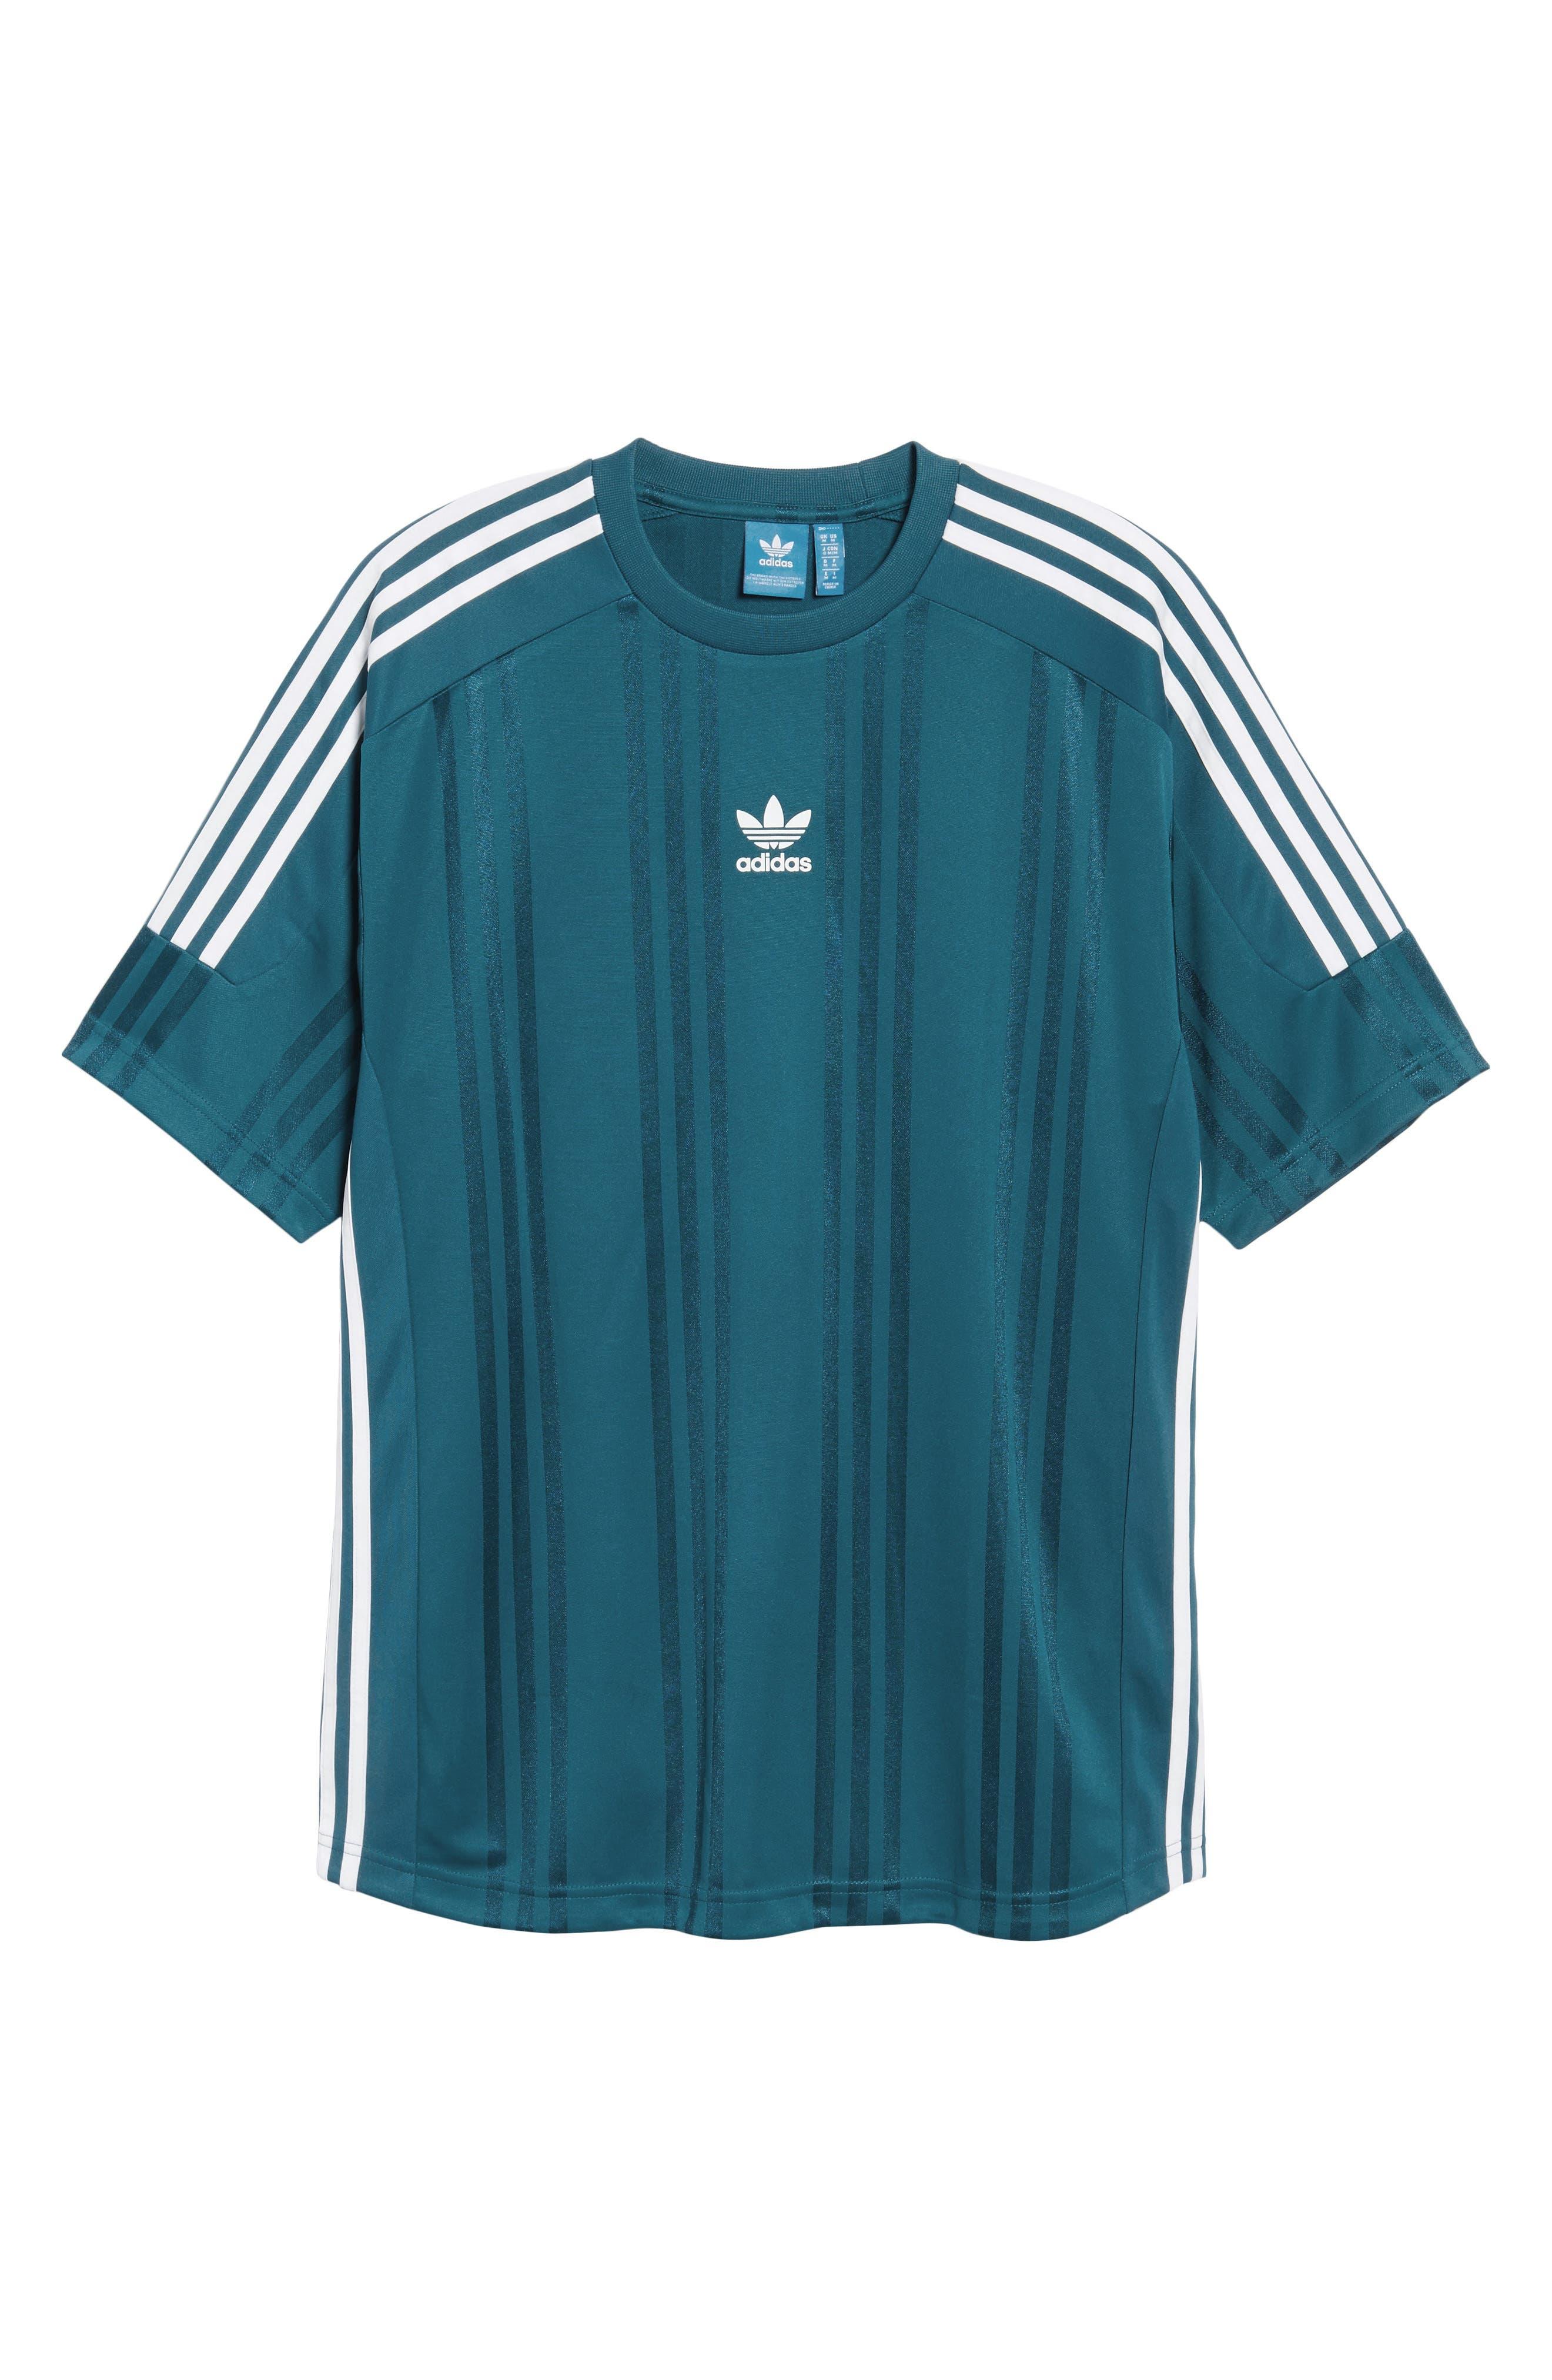 Originals Jacquard Stripe T-Shirt,                             Alternate thumbnail 18, color,